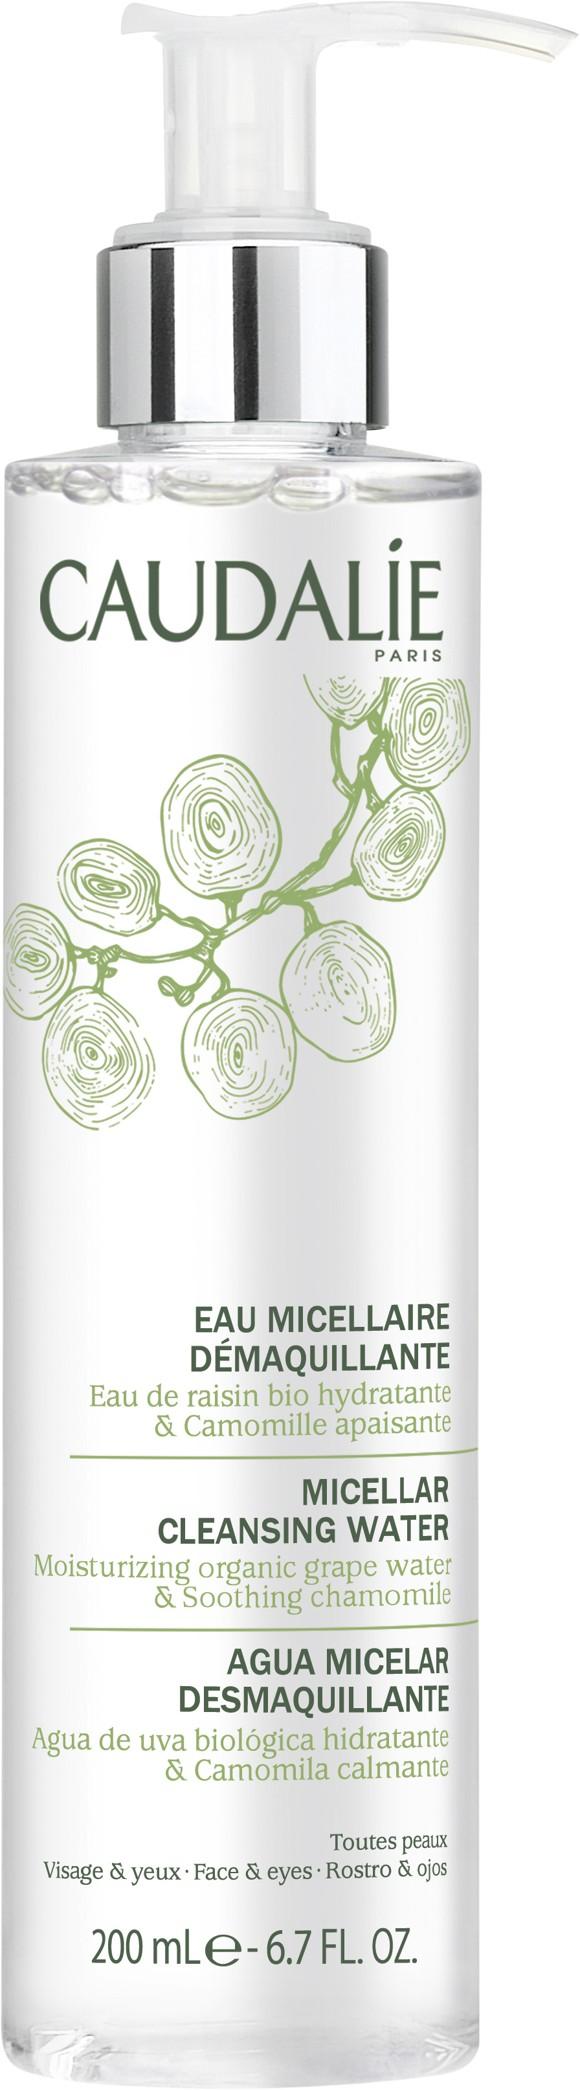 Caudalie - Micellar Cleansing Water 200 ml